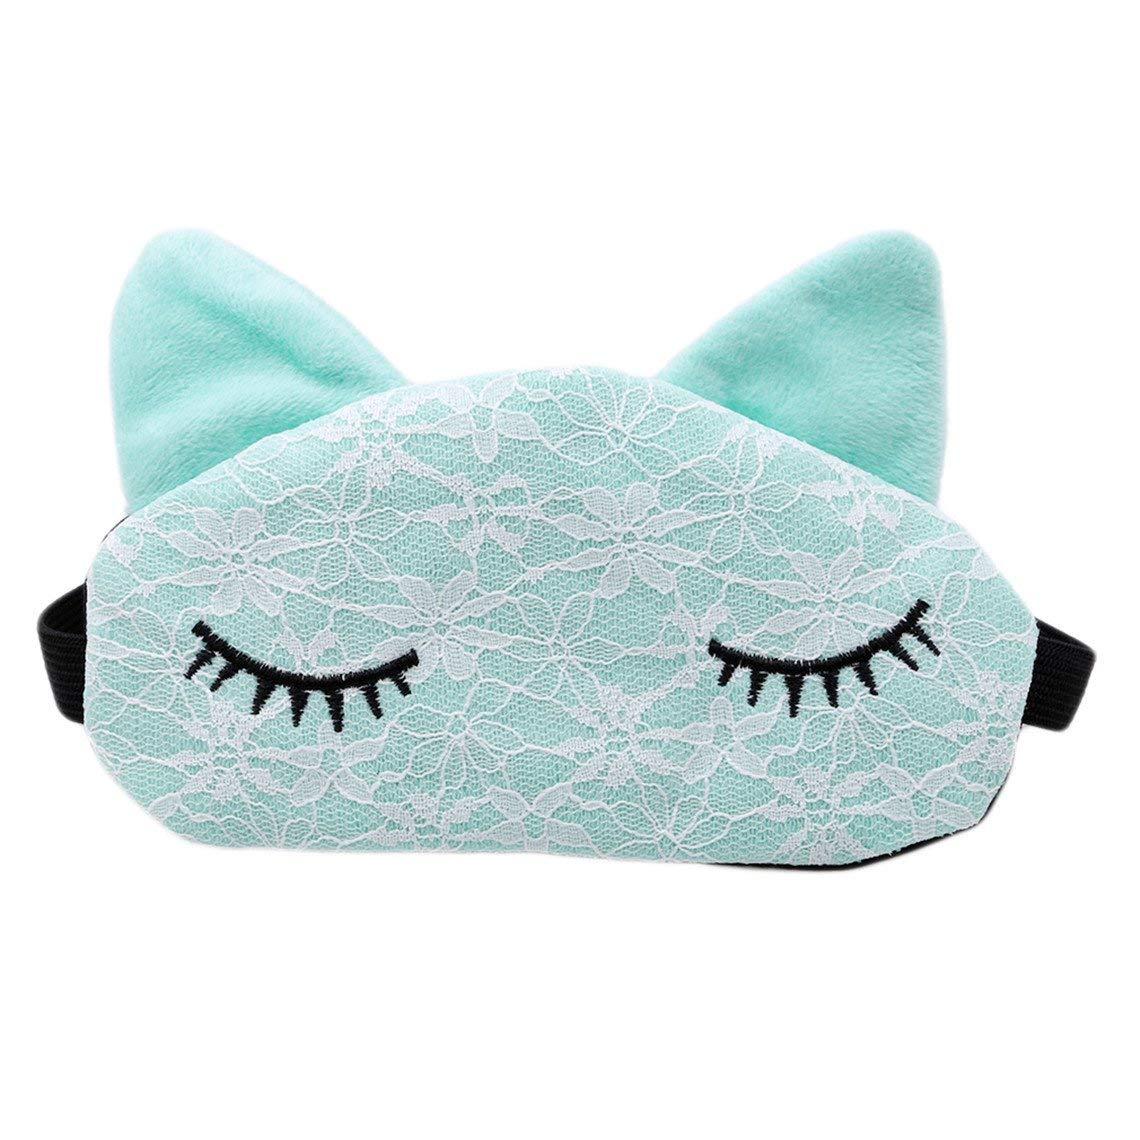 d75e6c535 Get Quotations · Rurah Cute Women Ladies Comfortable Sleep Blindfold Mask  Lace Eye Cover Travel Sleeping Blinder Mask Night